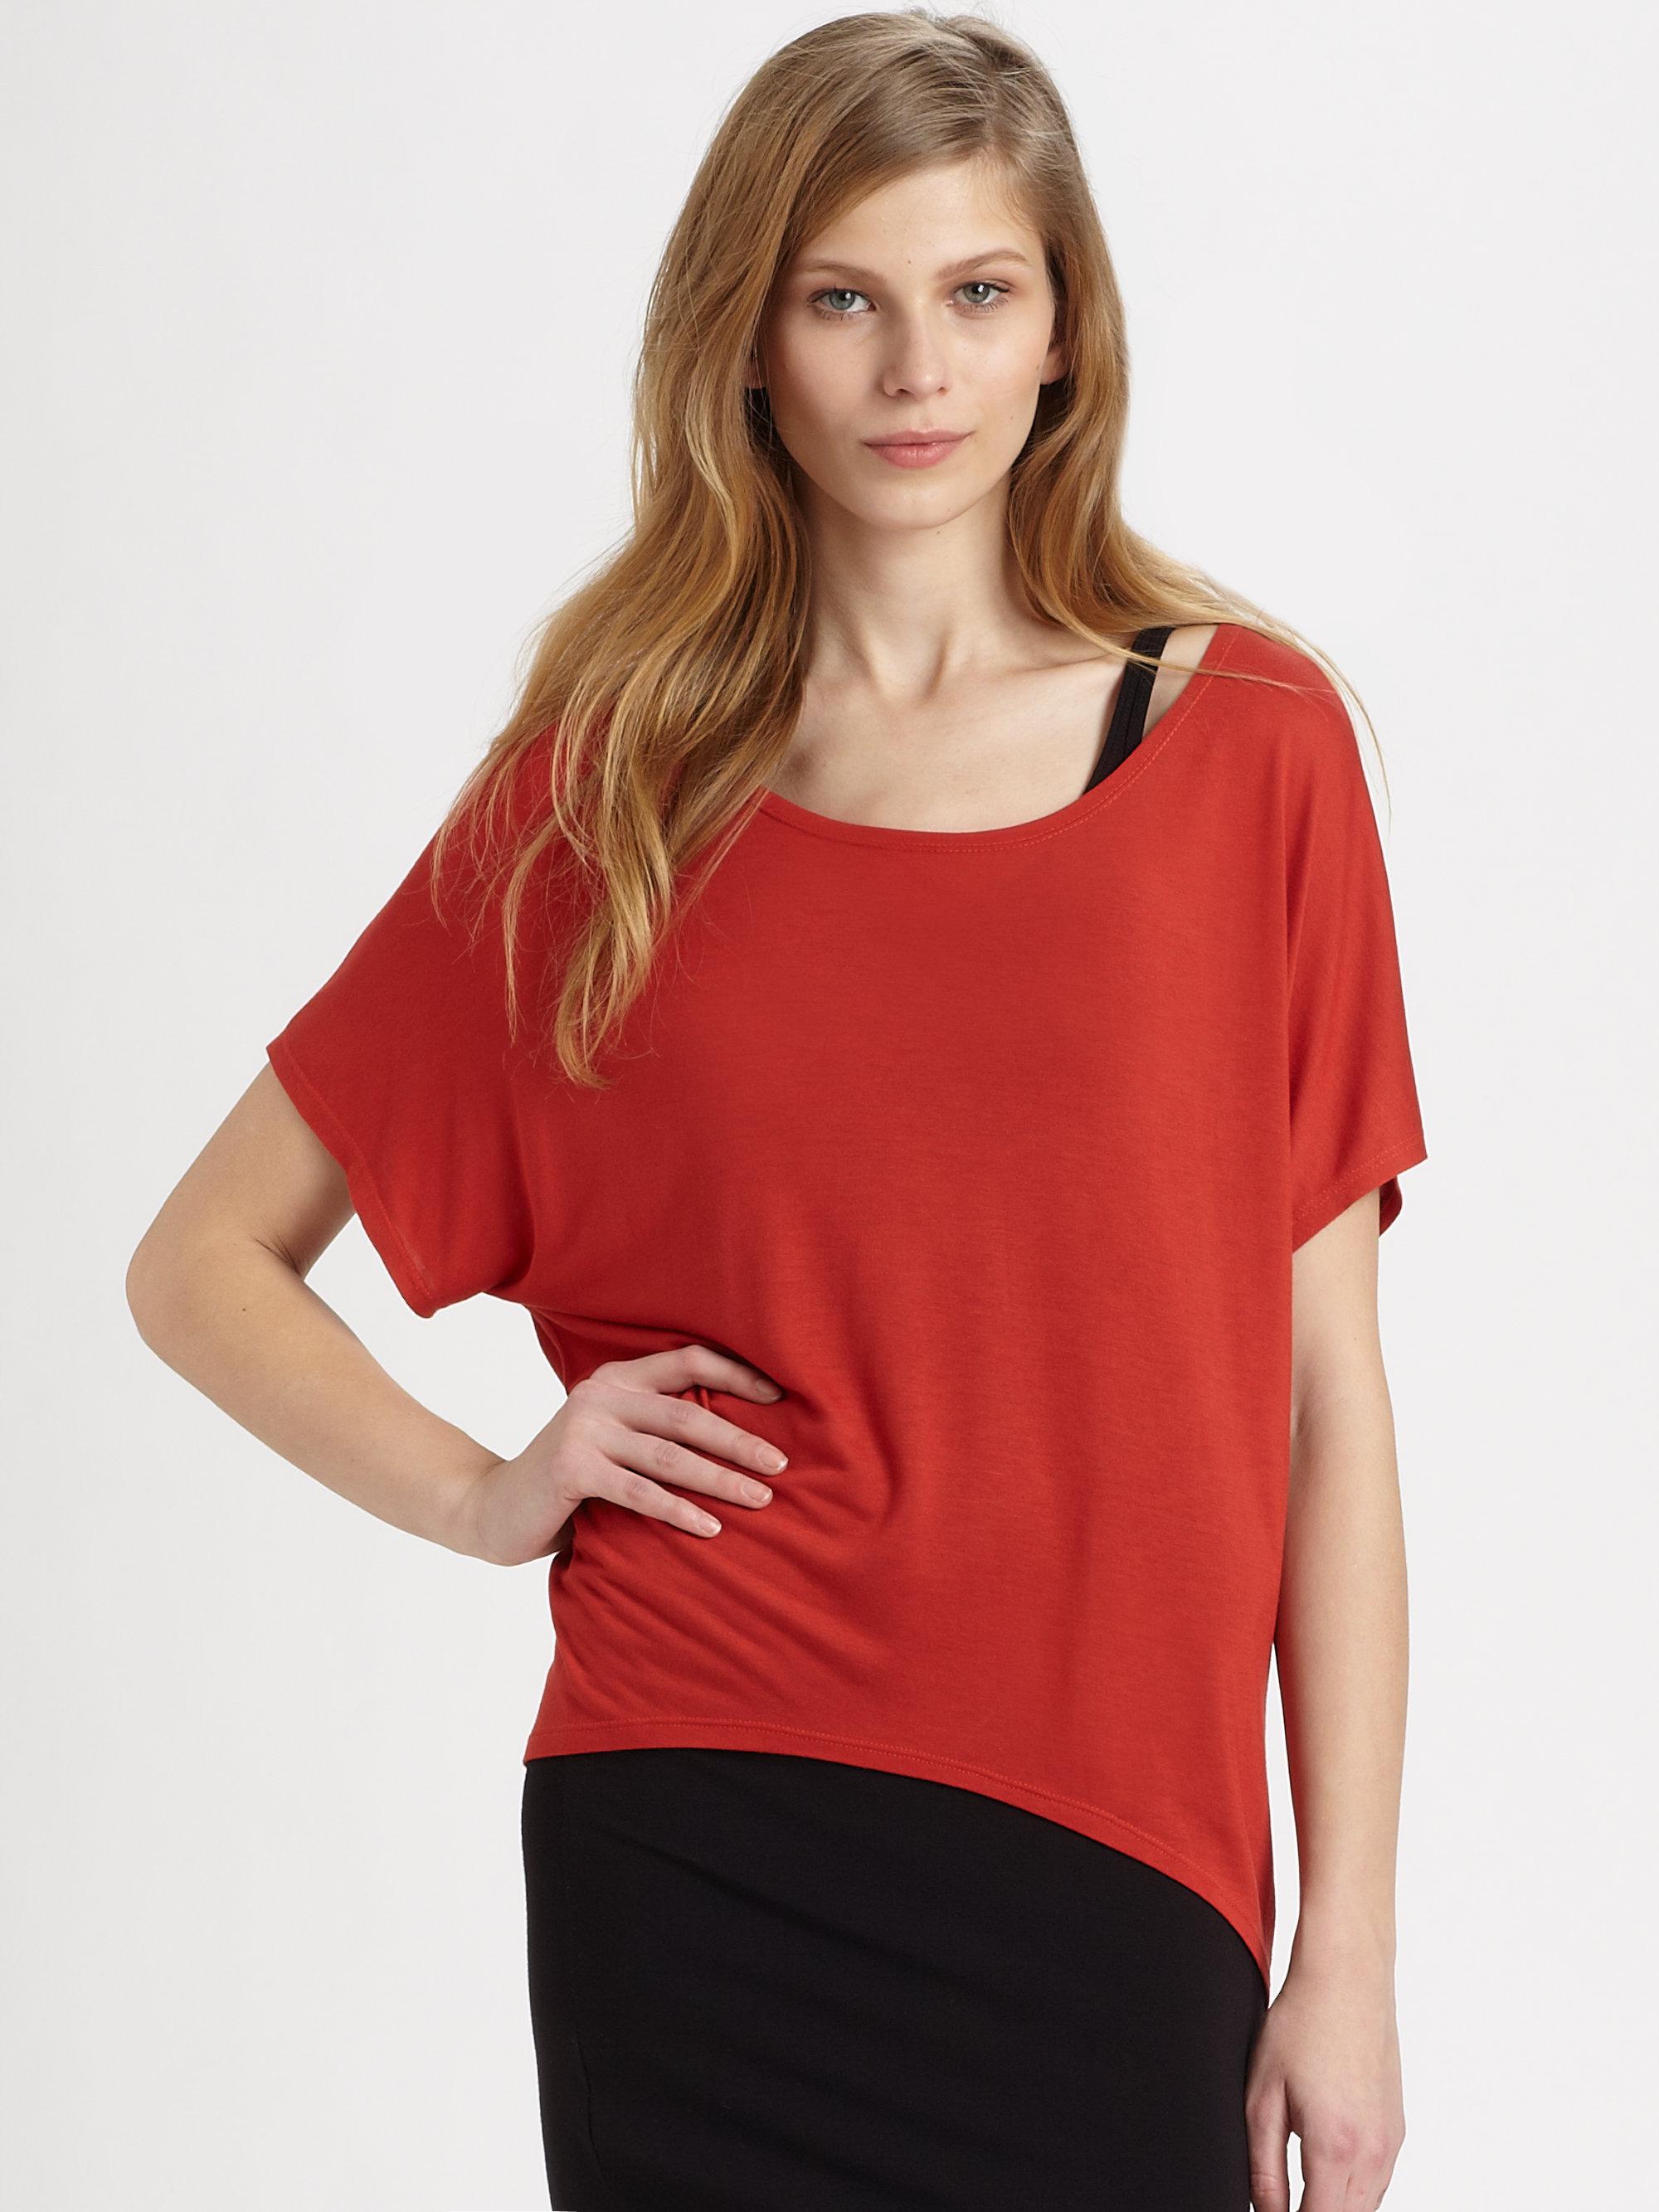 kimberly ovitz doni tshirt in red lyst